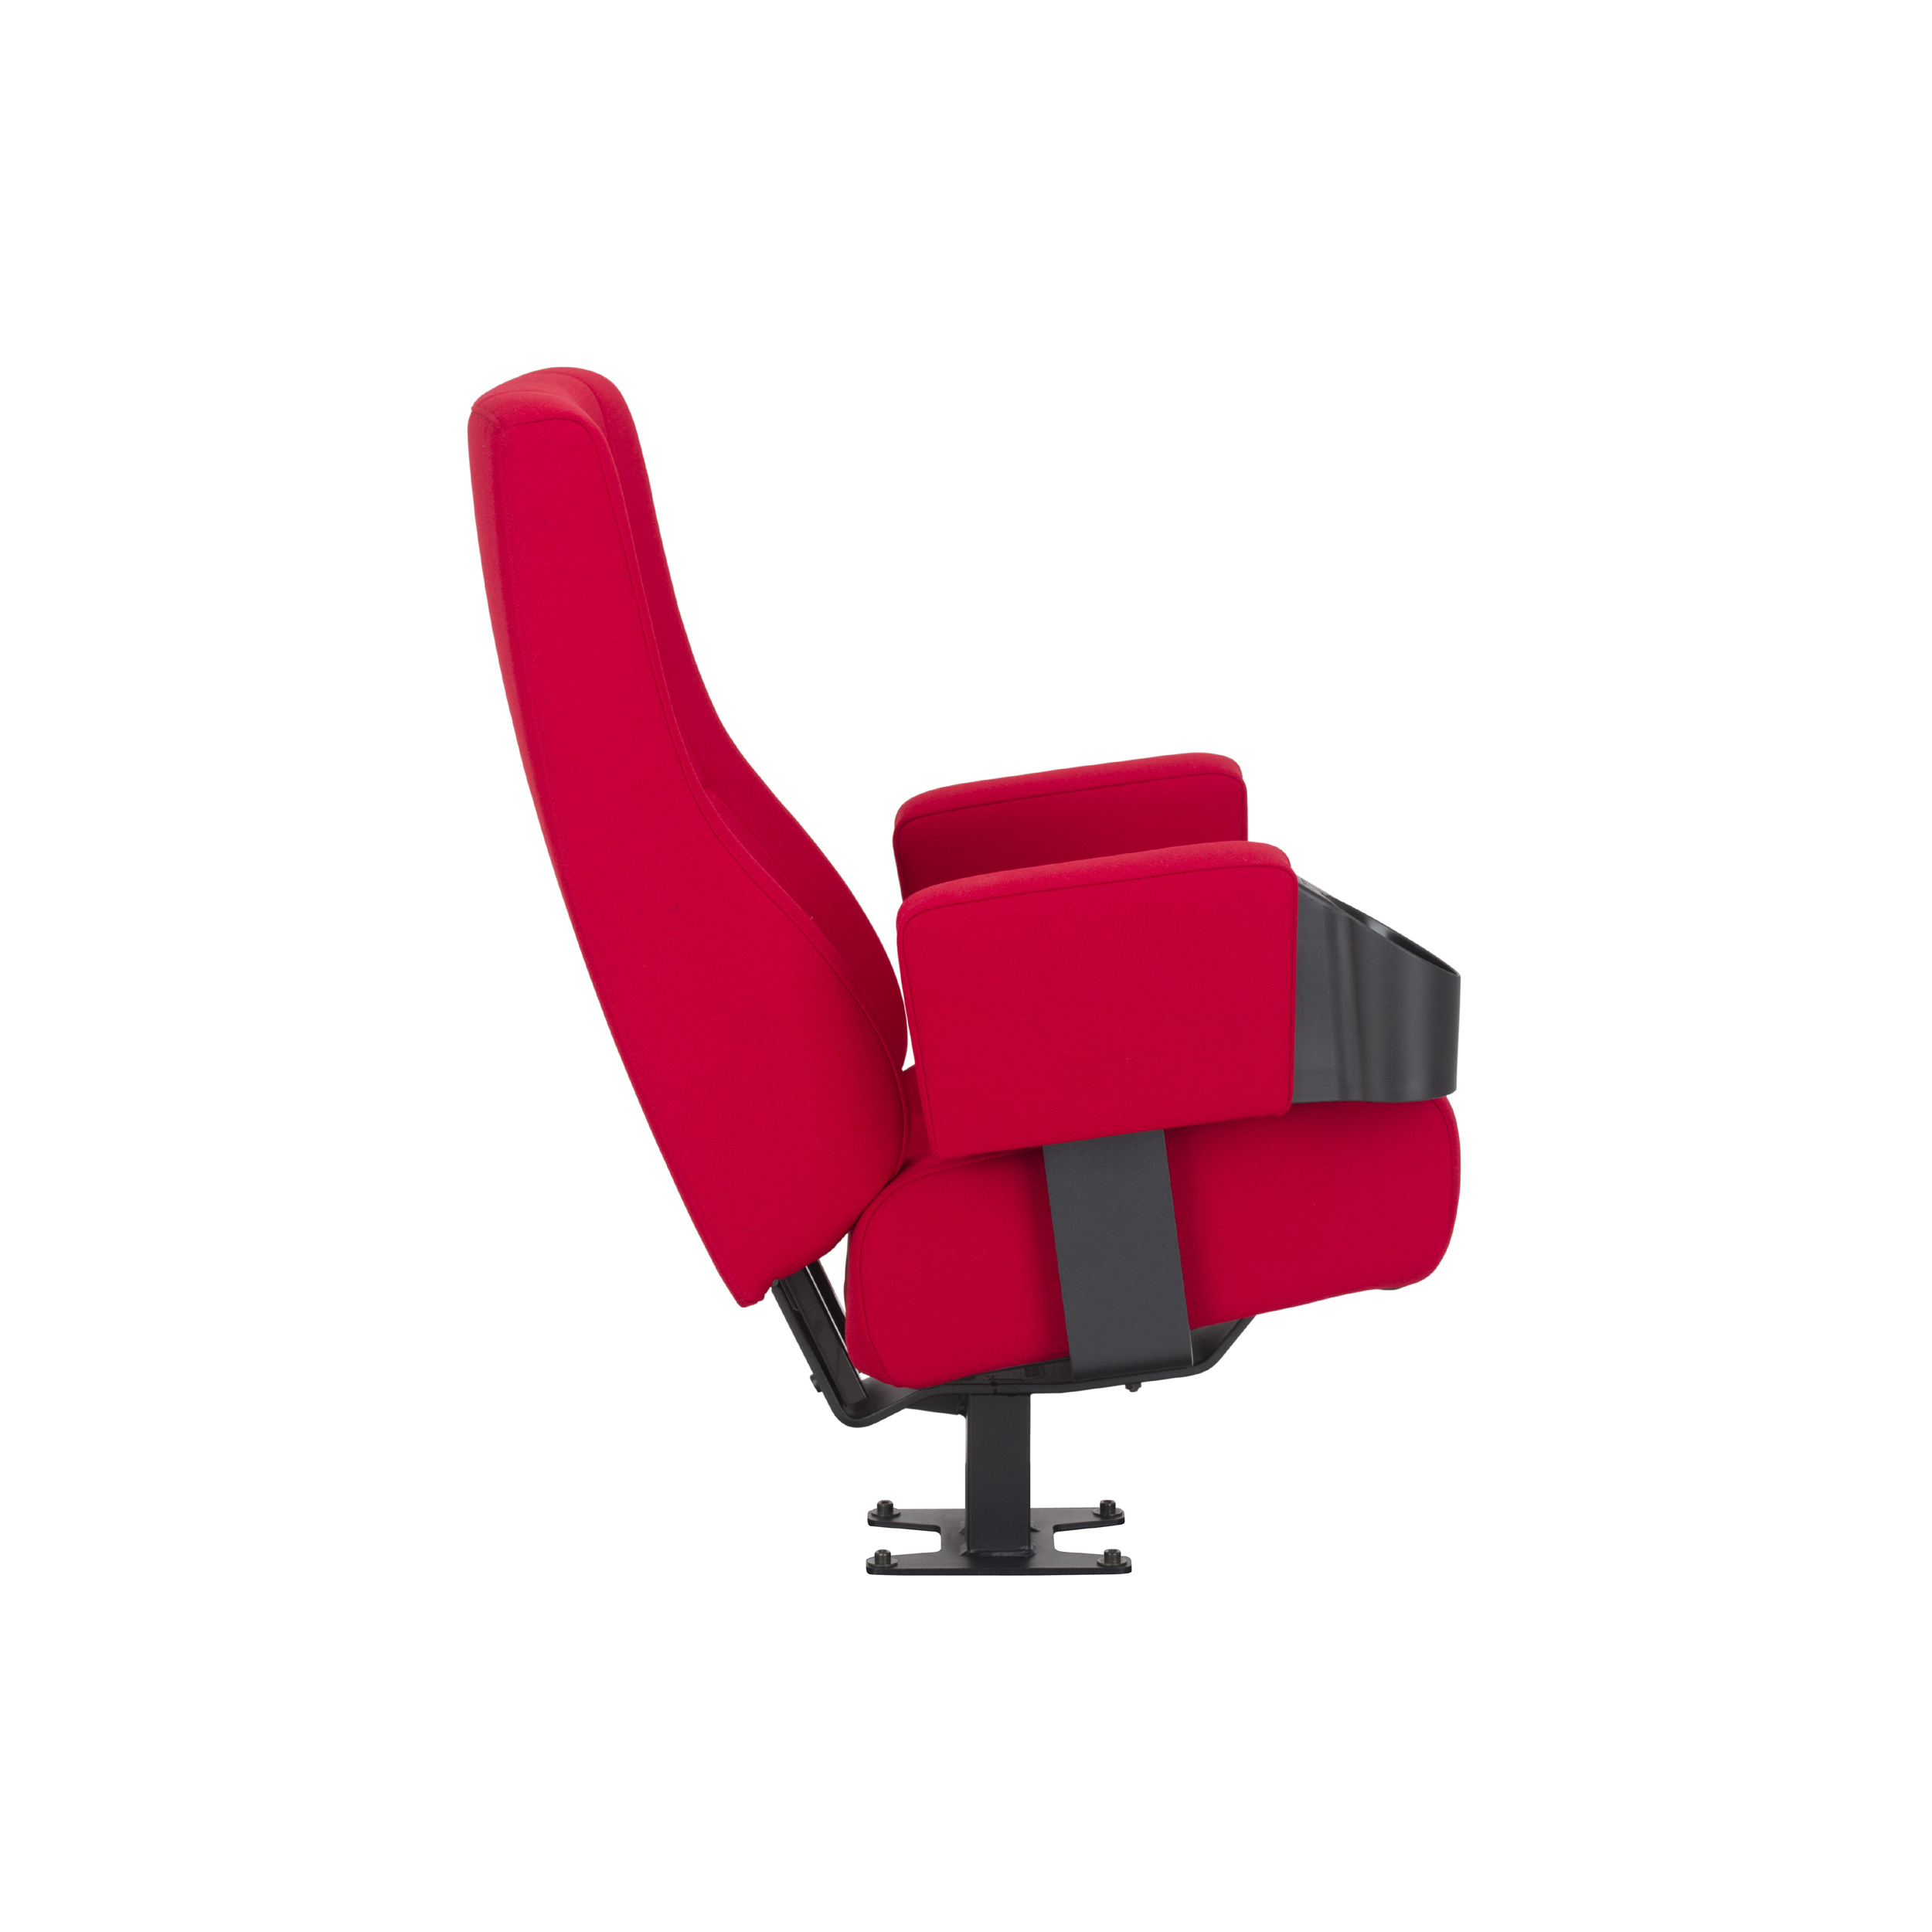 forum-seating_1-1_humprey-12.jpg